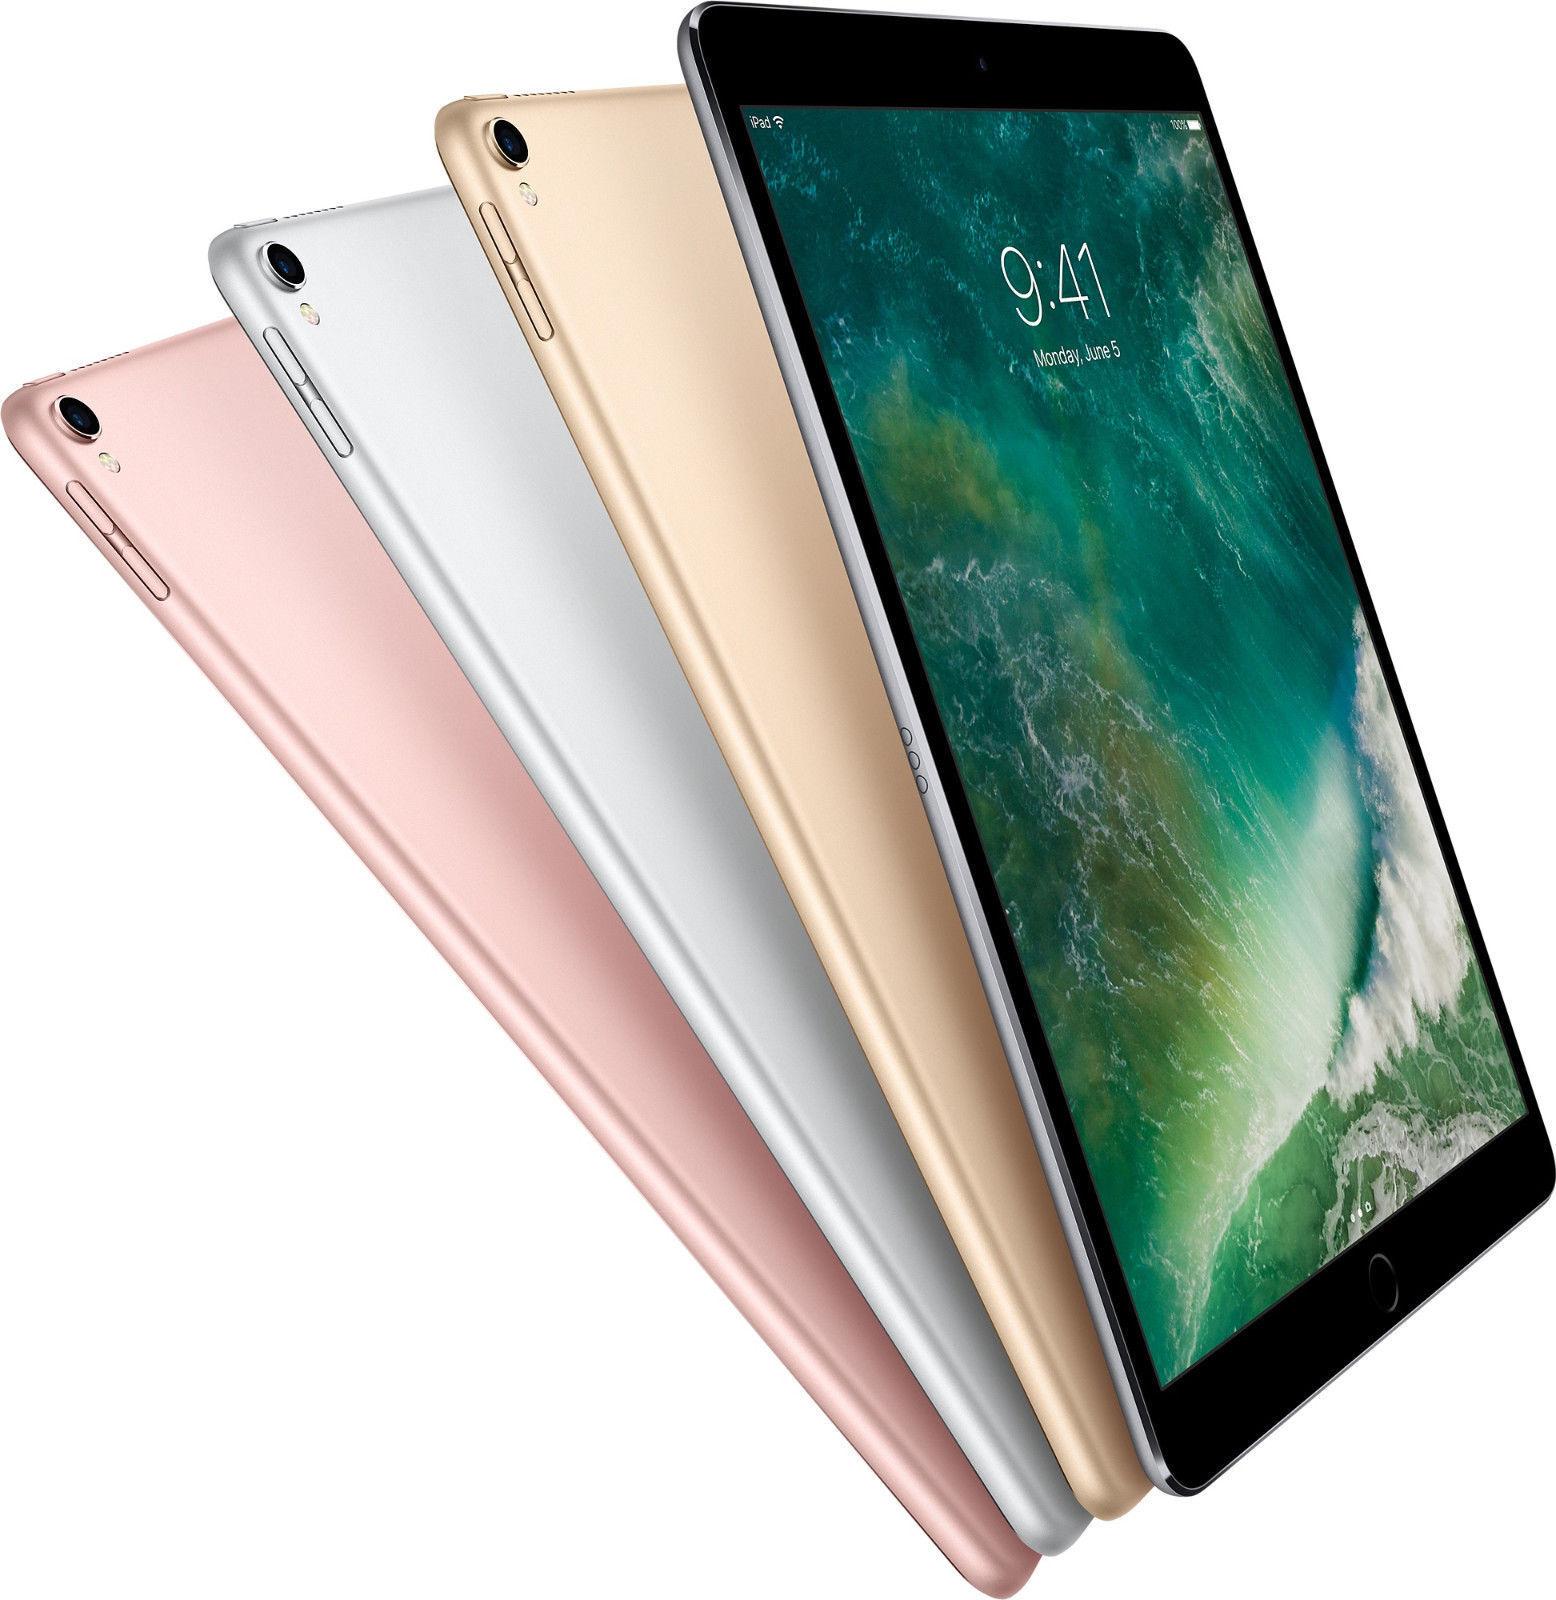 "Ipad - Apple iPad Pro 128GB WIFI+Cellular 12.9"" Retina Display Touch ID iOS Tablet"